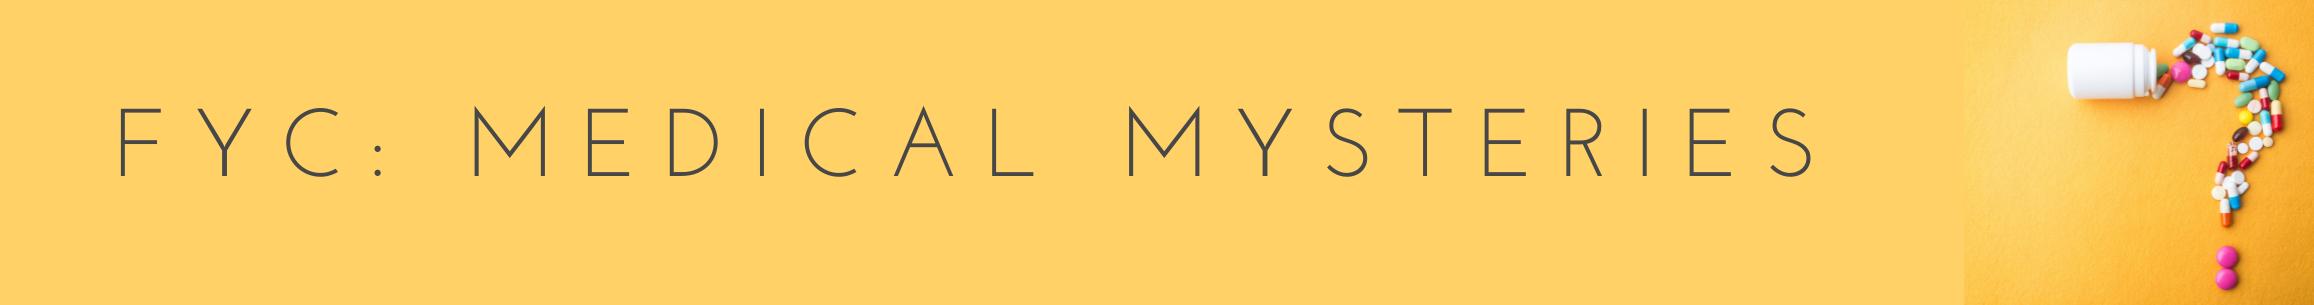 FYC: Medical Mysteries